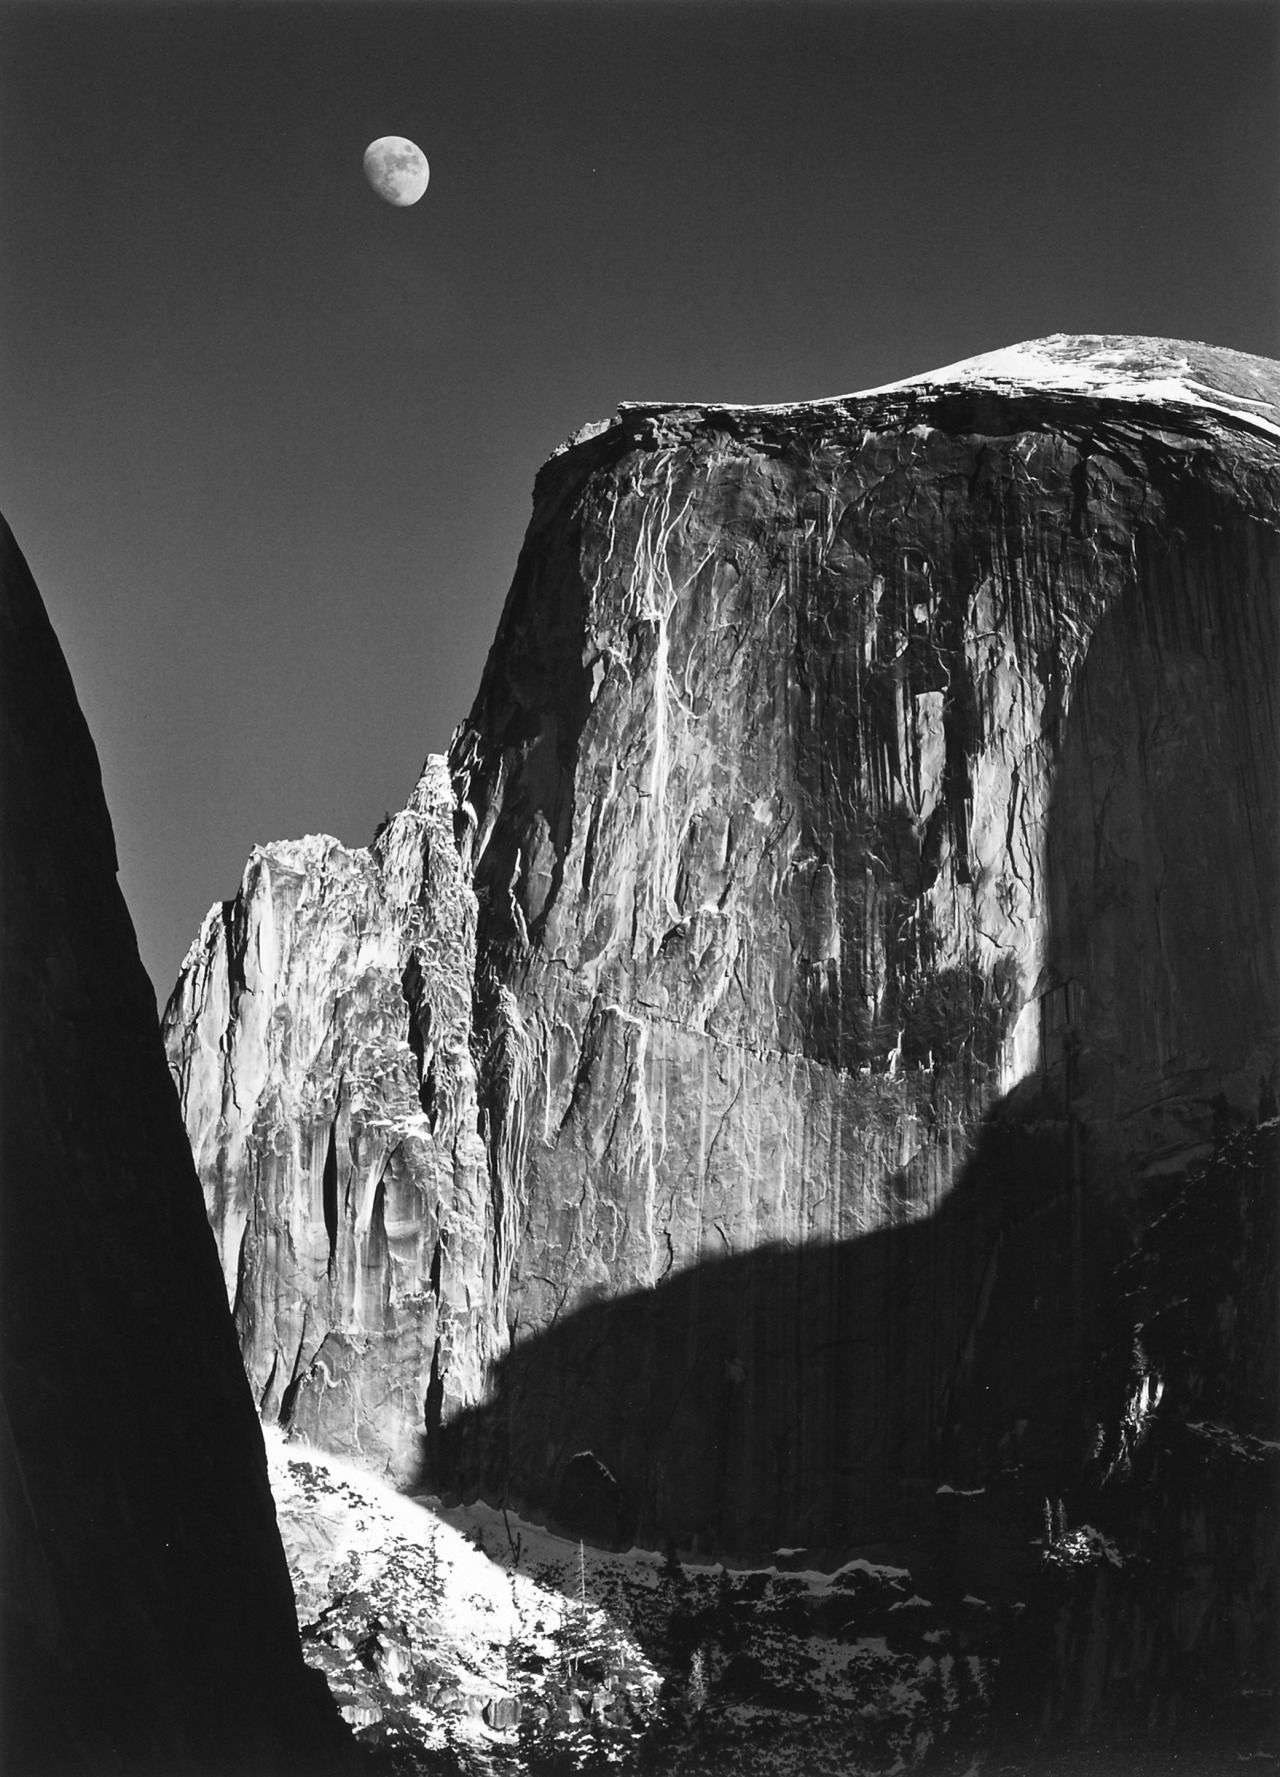 flashofgod: Ansel Adams, Moon and Half Dome, Yosemite National Park ...